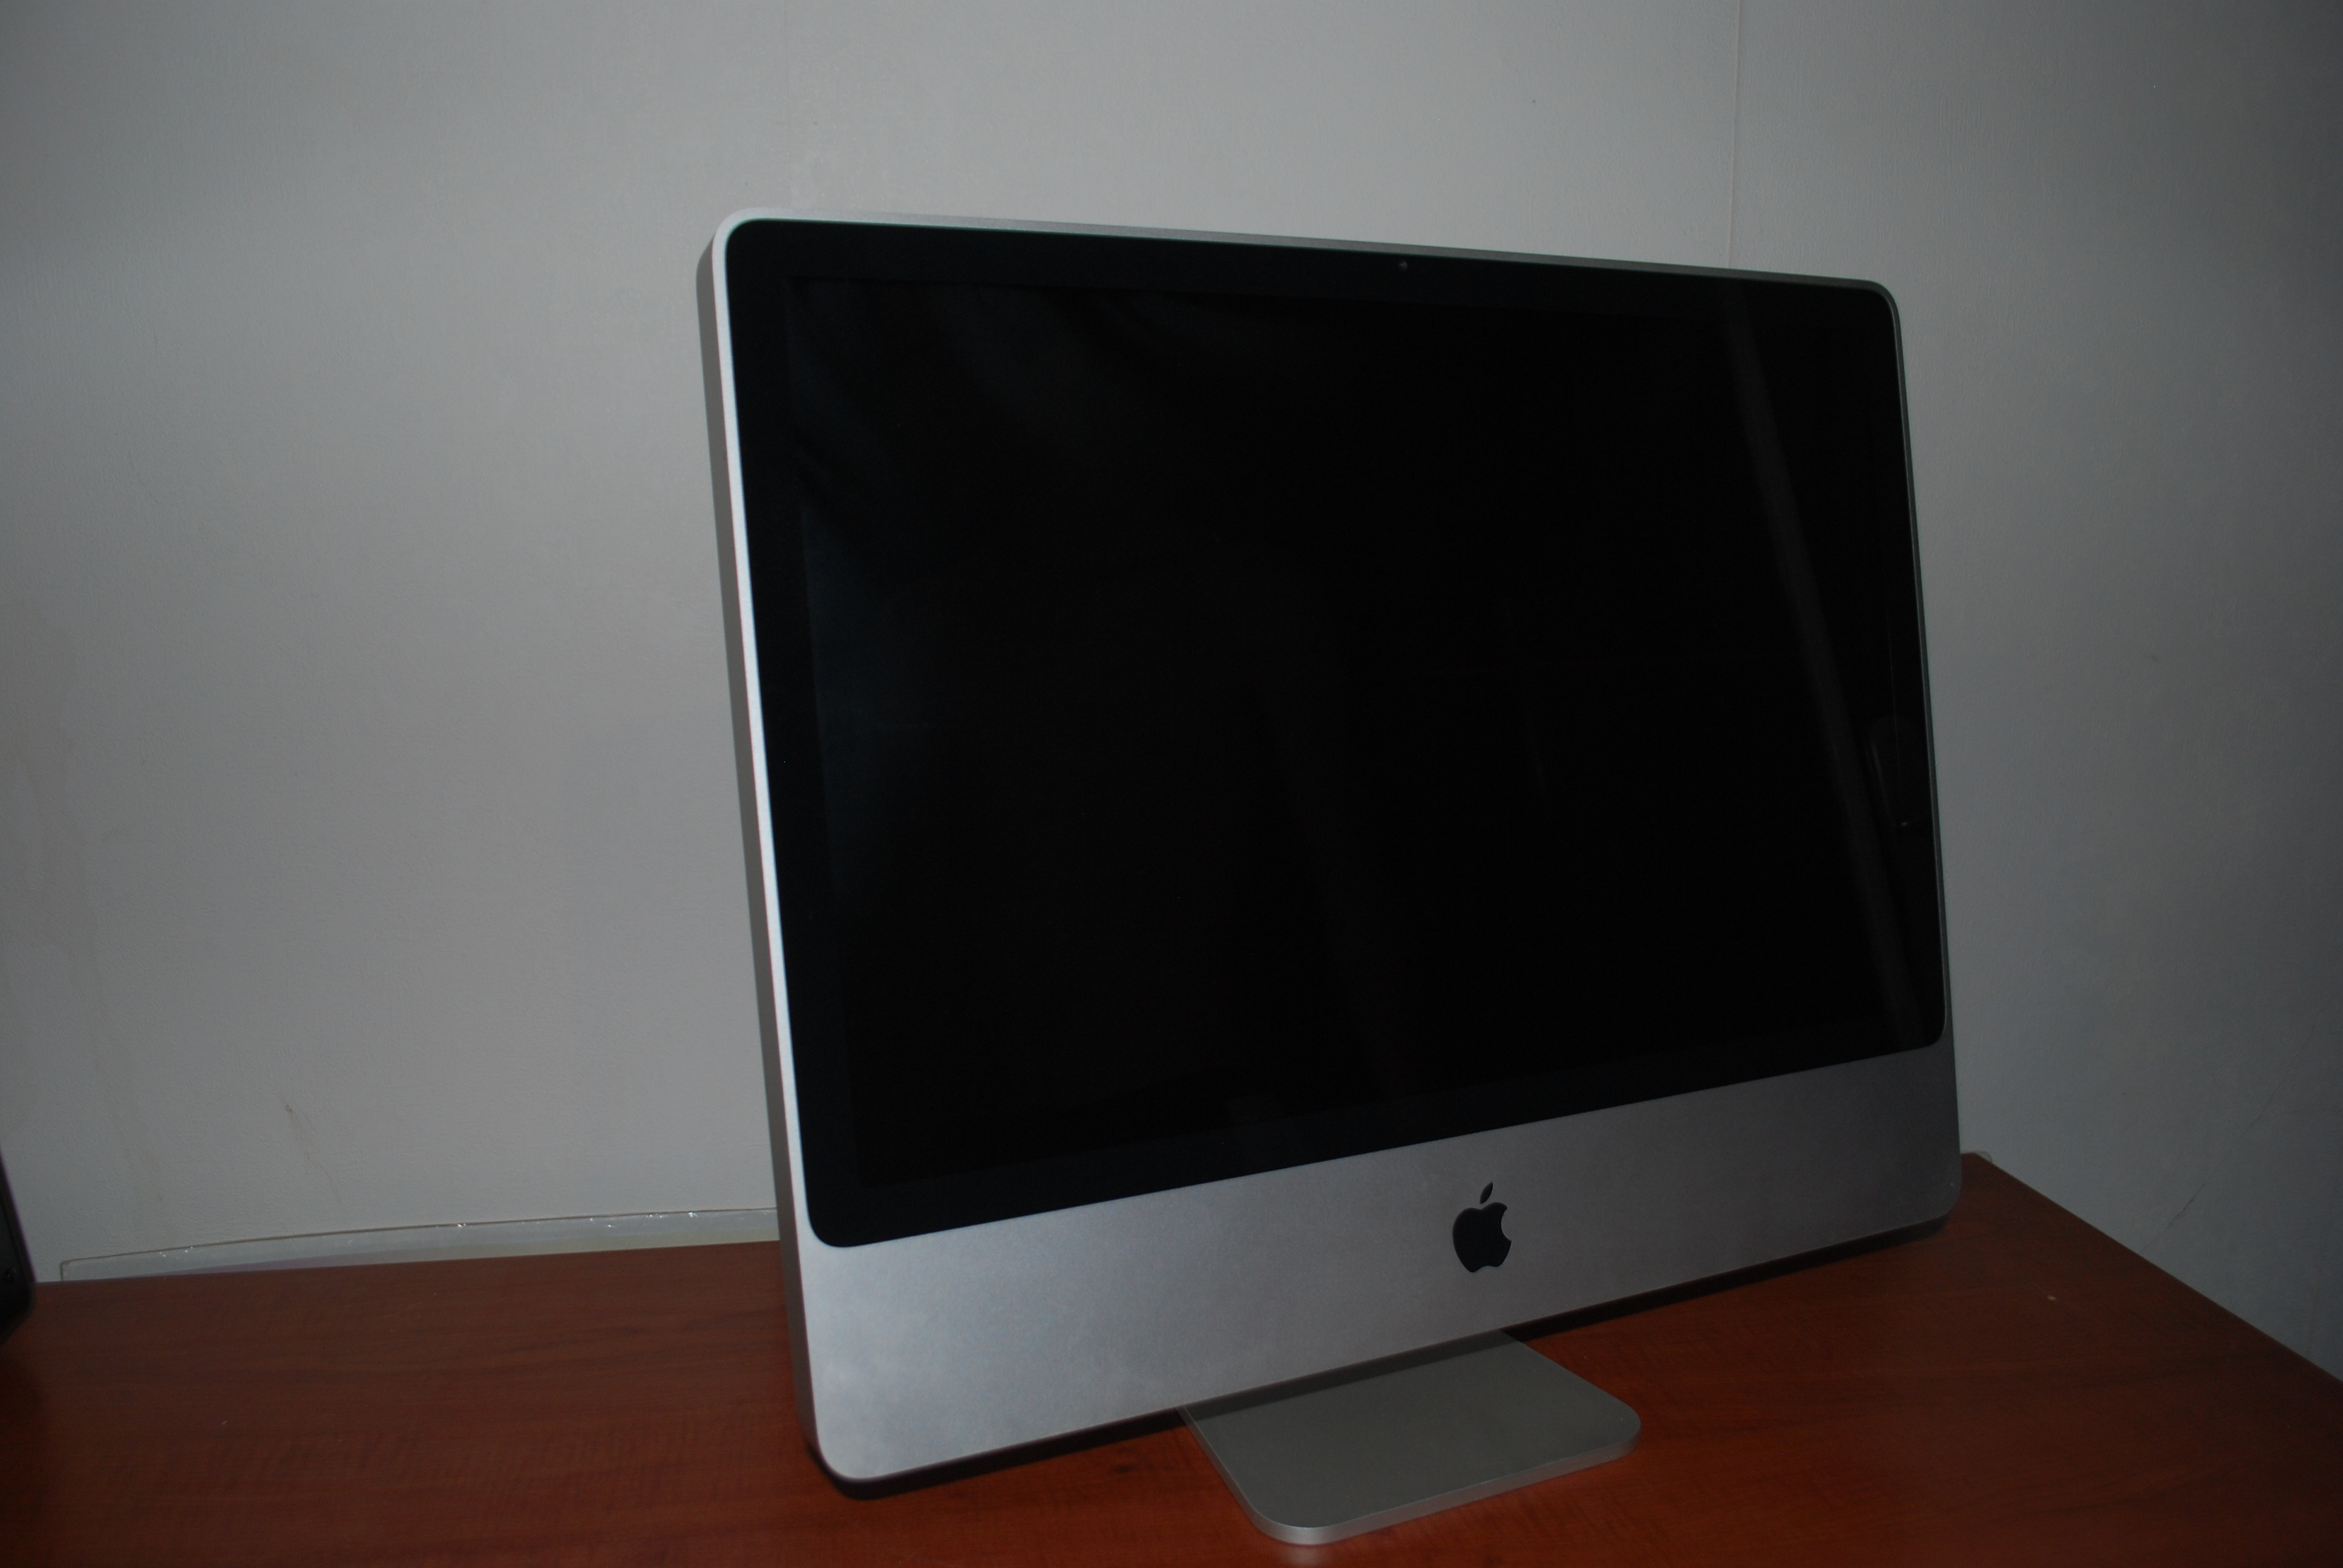 apple desktop iMac  Ghz medias pictures aplaym